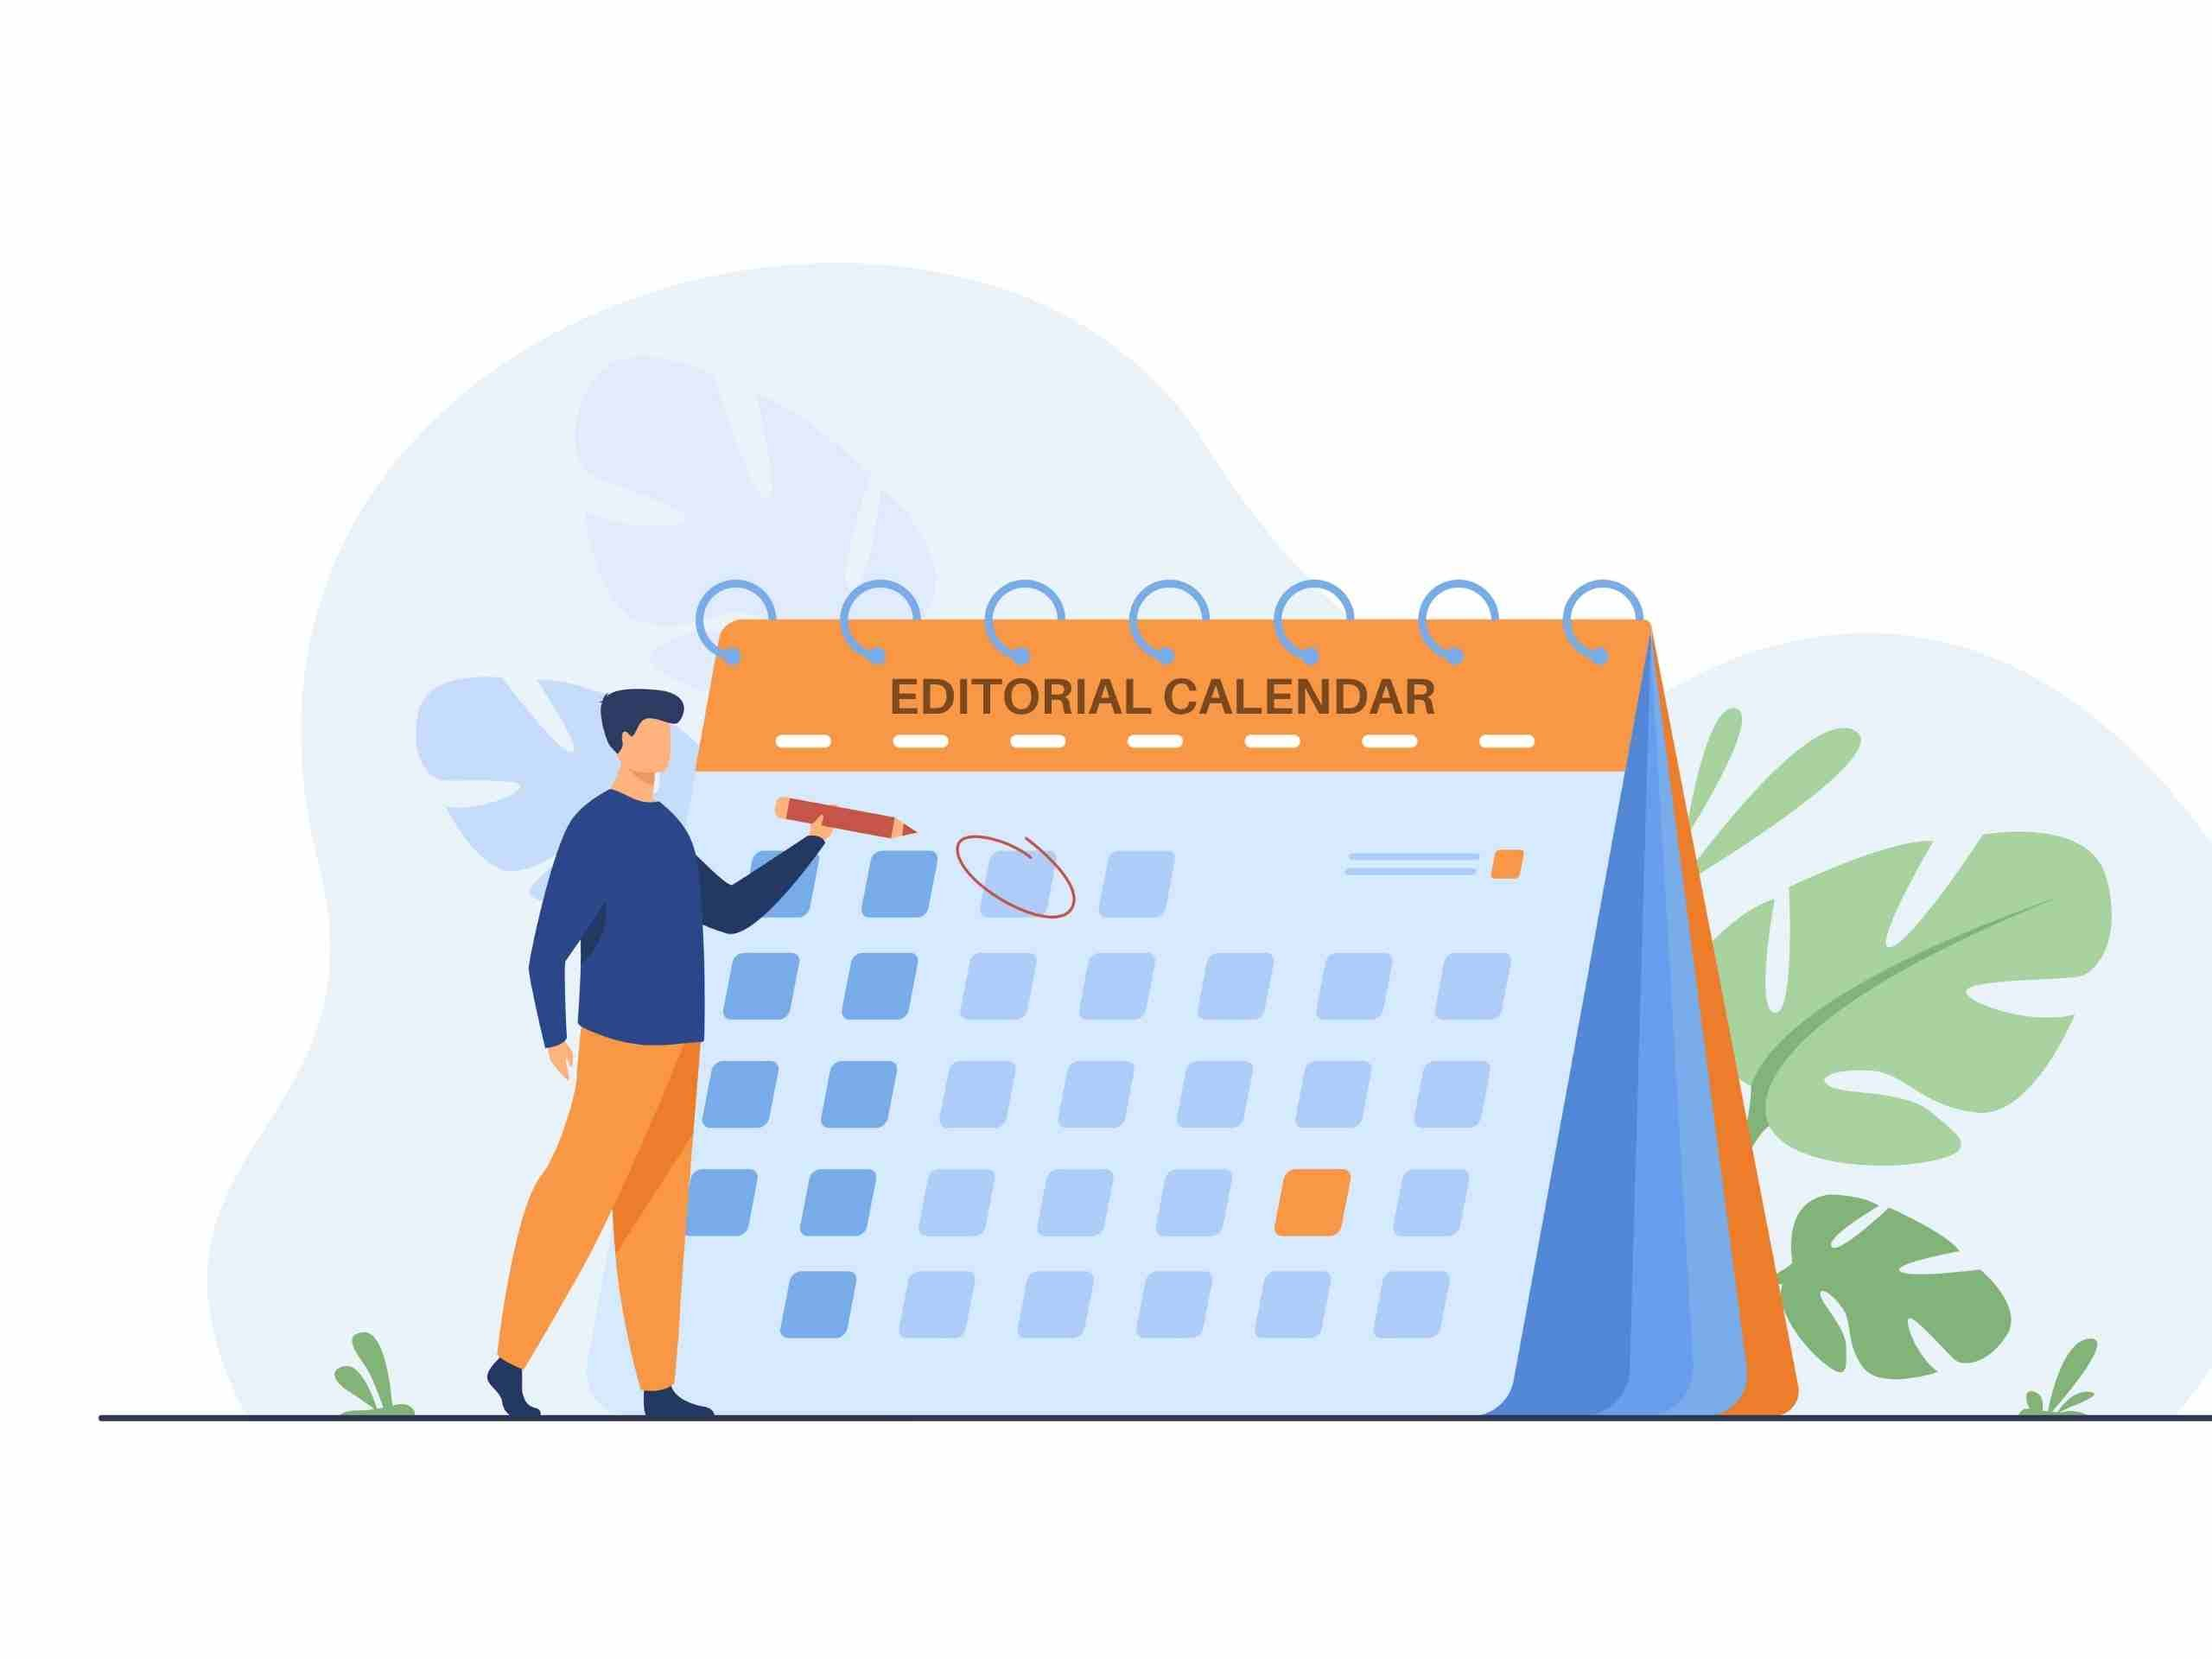 Build your editorial calendar